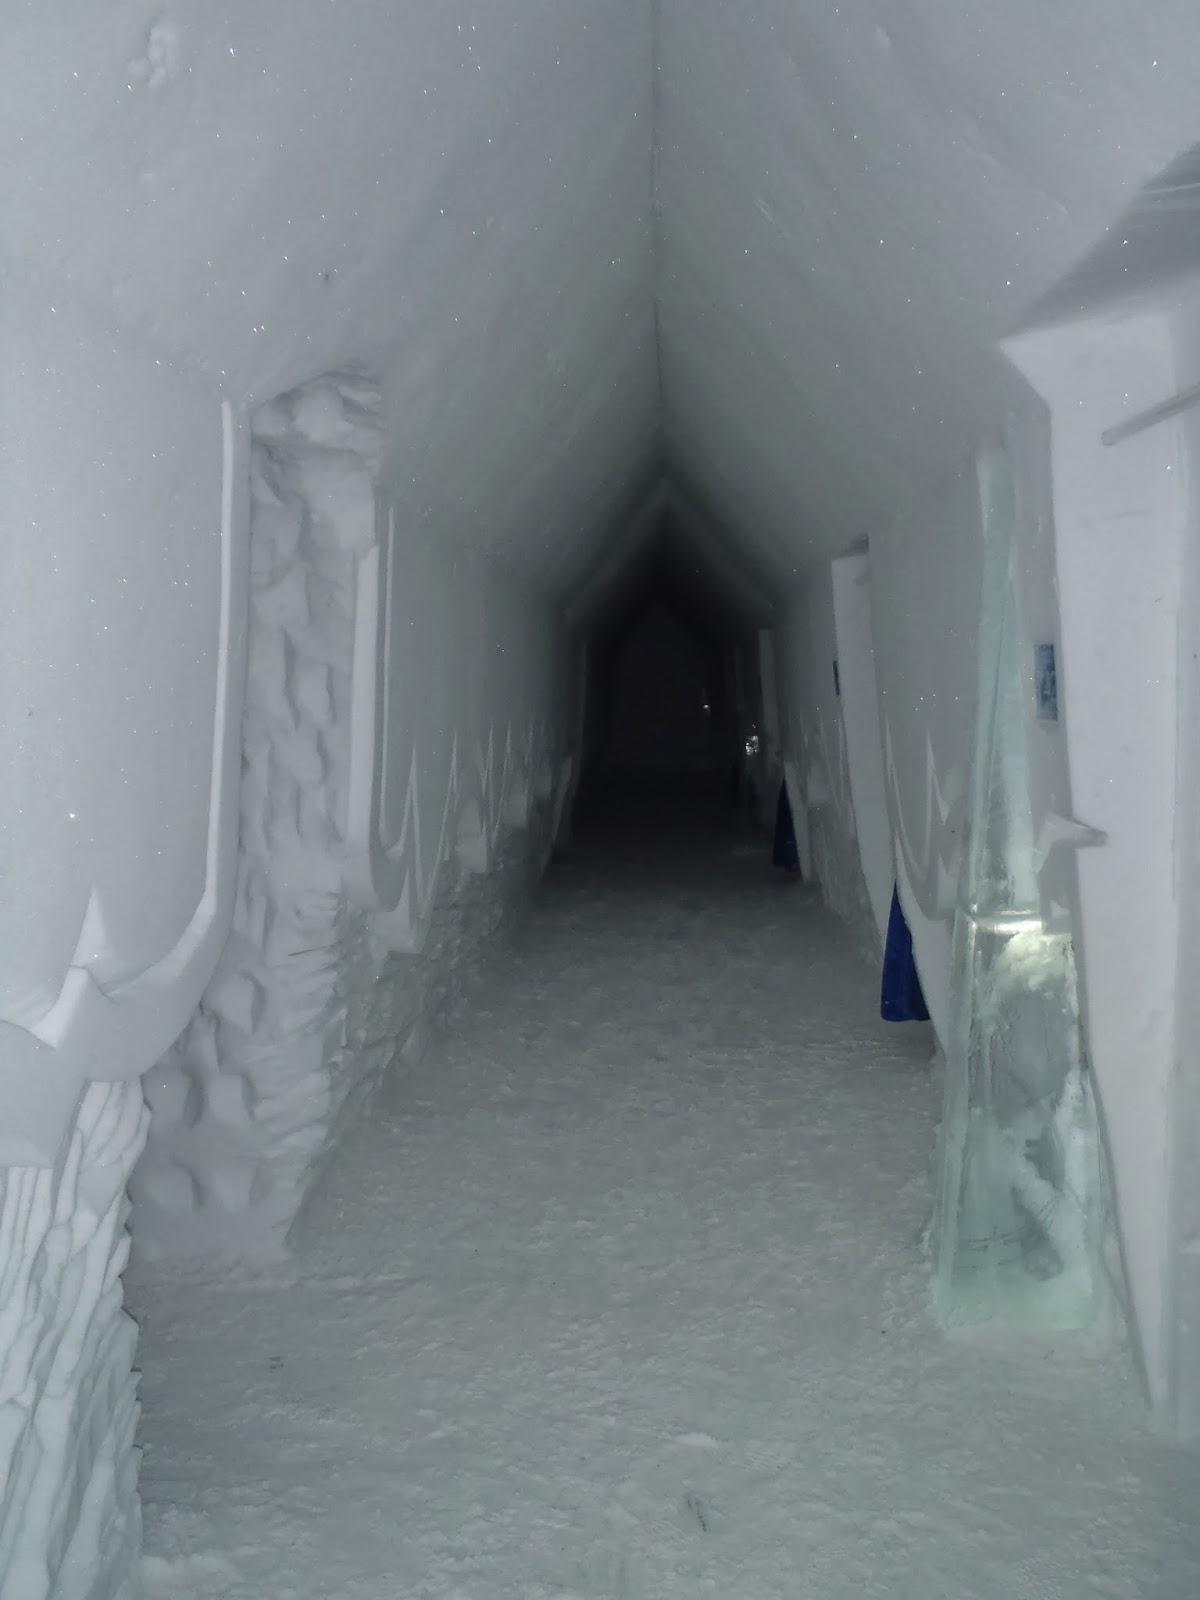 Hotel De Glace ice hallway